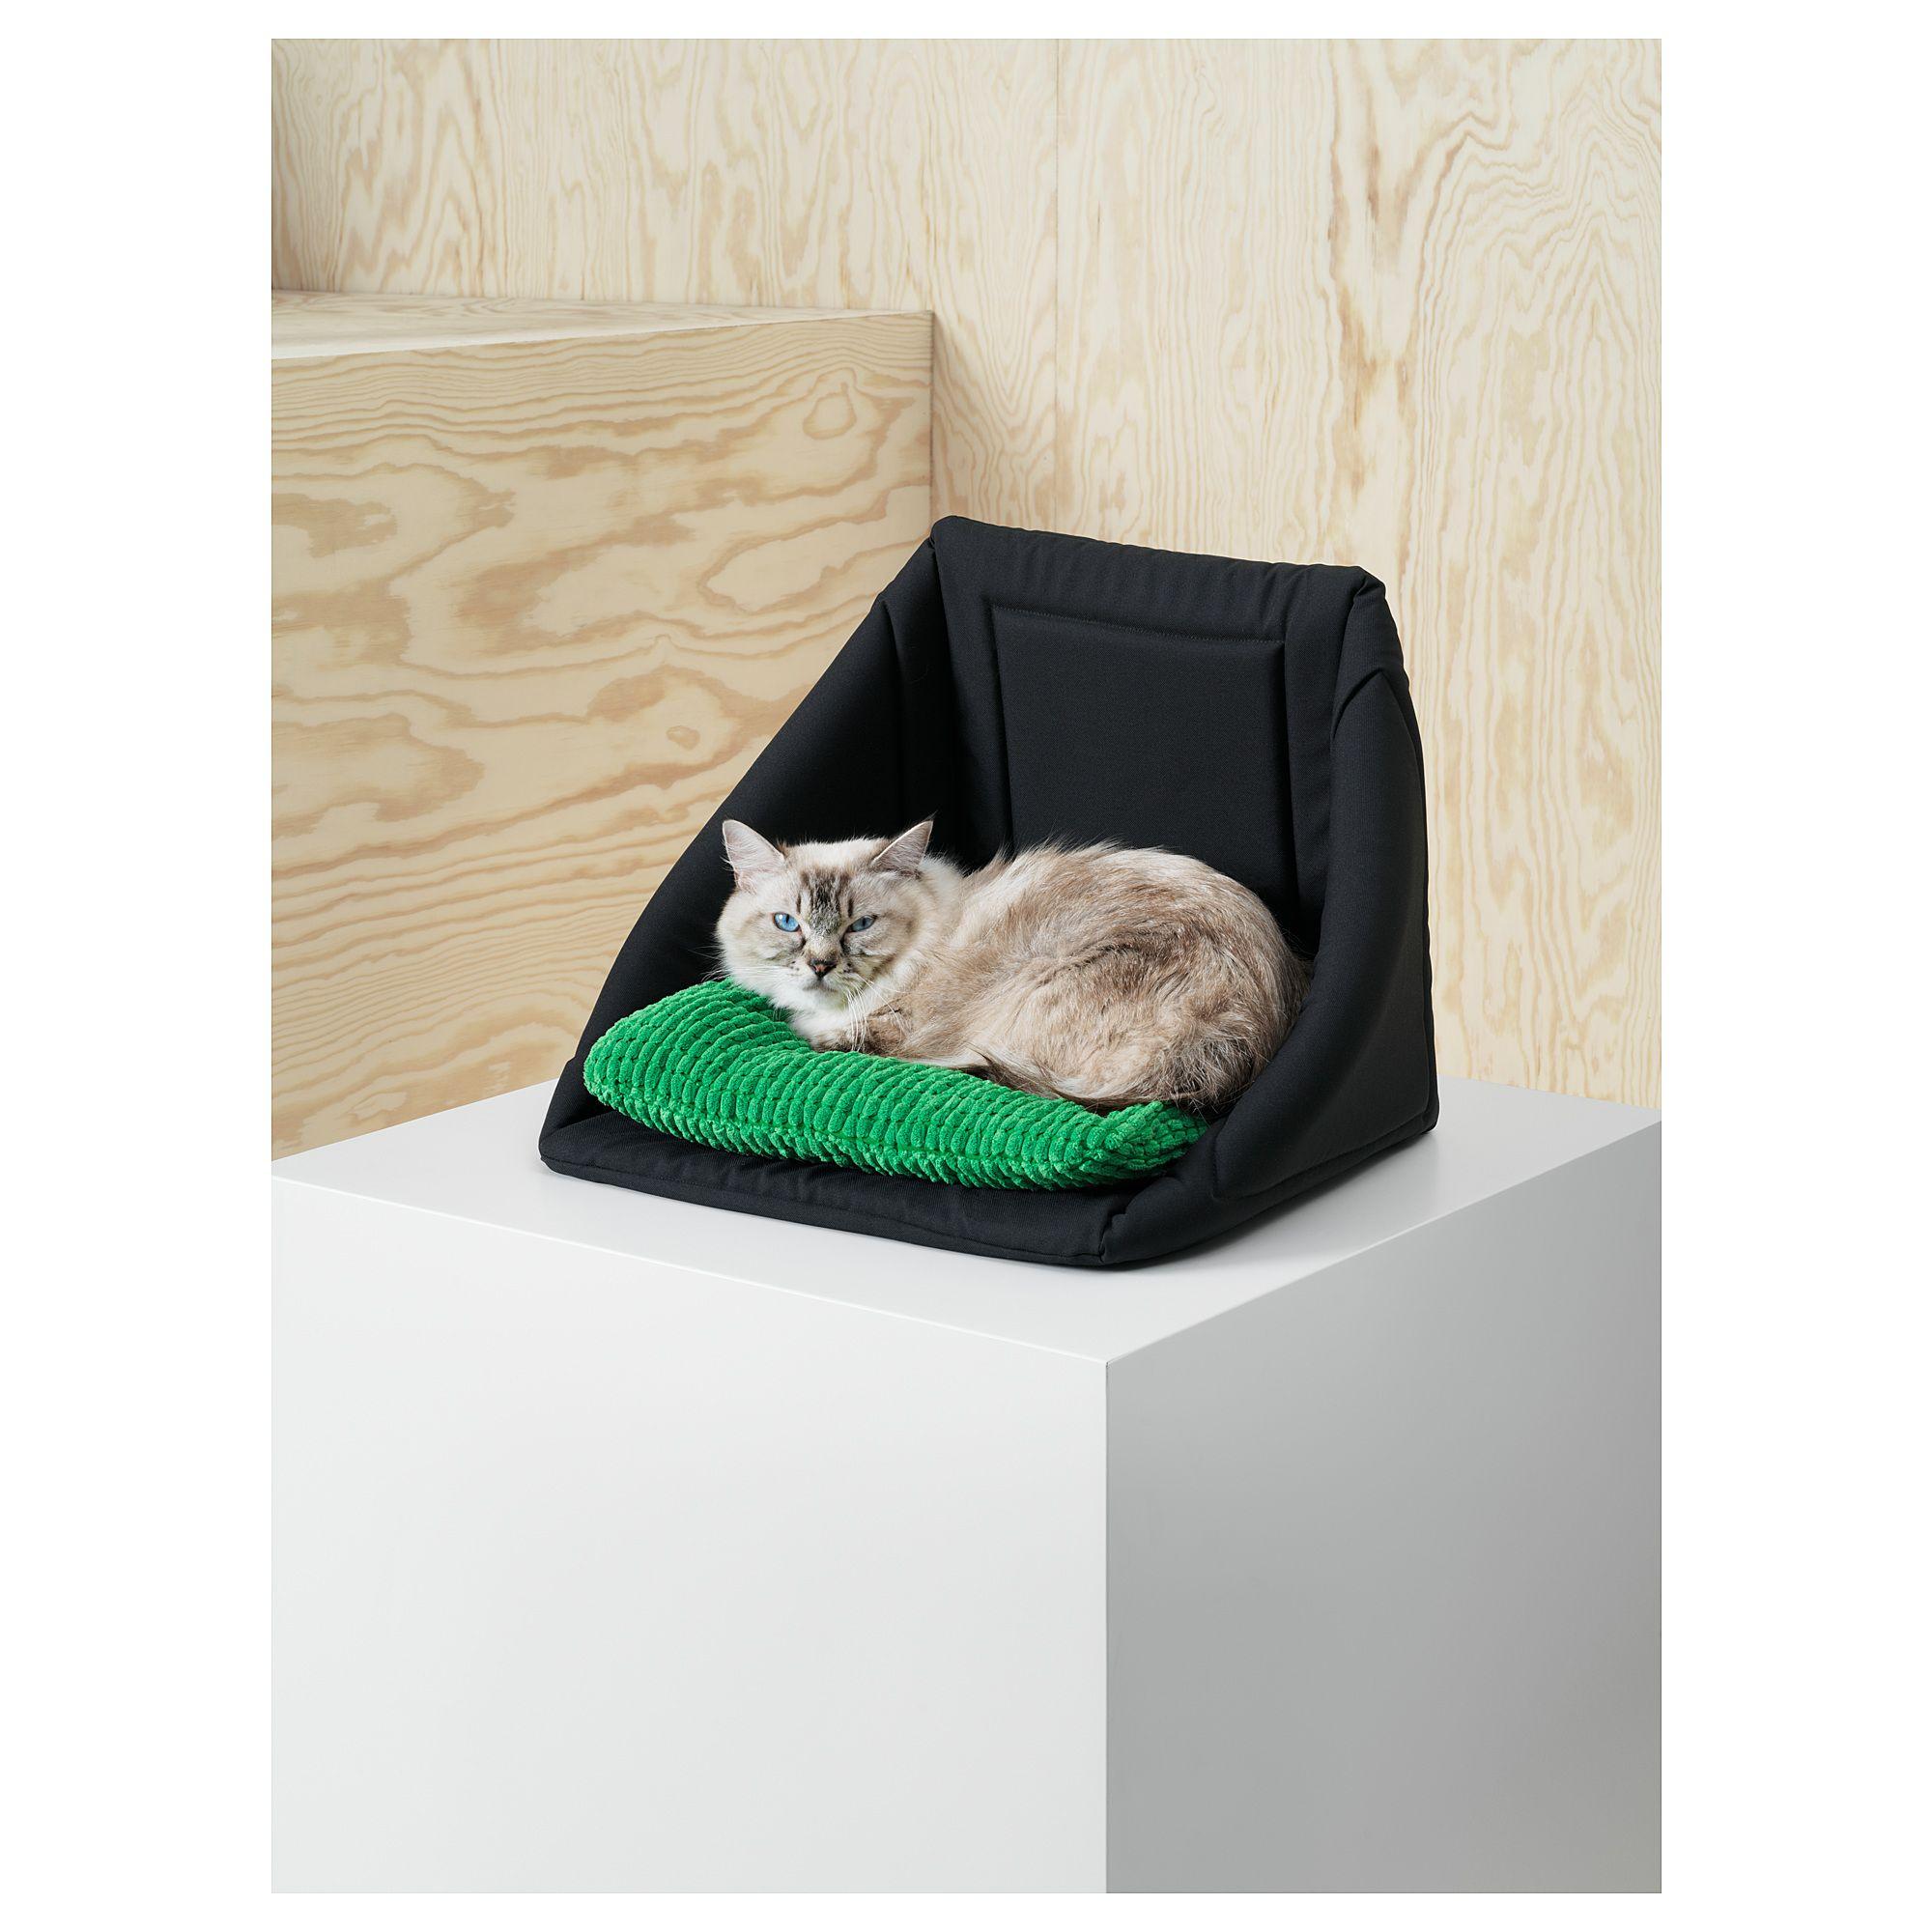 Ikea Lurvig Cat Bed With Pad Black Green Pet Bed Pet